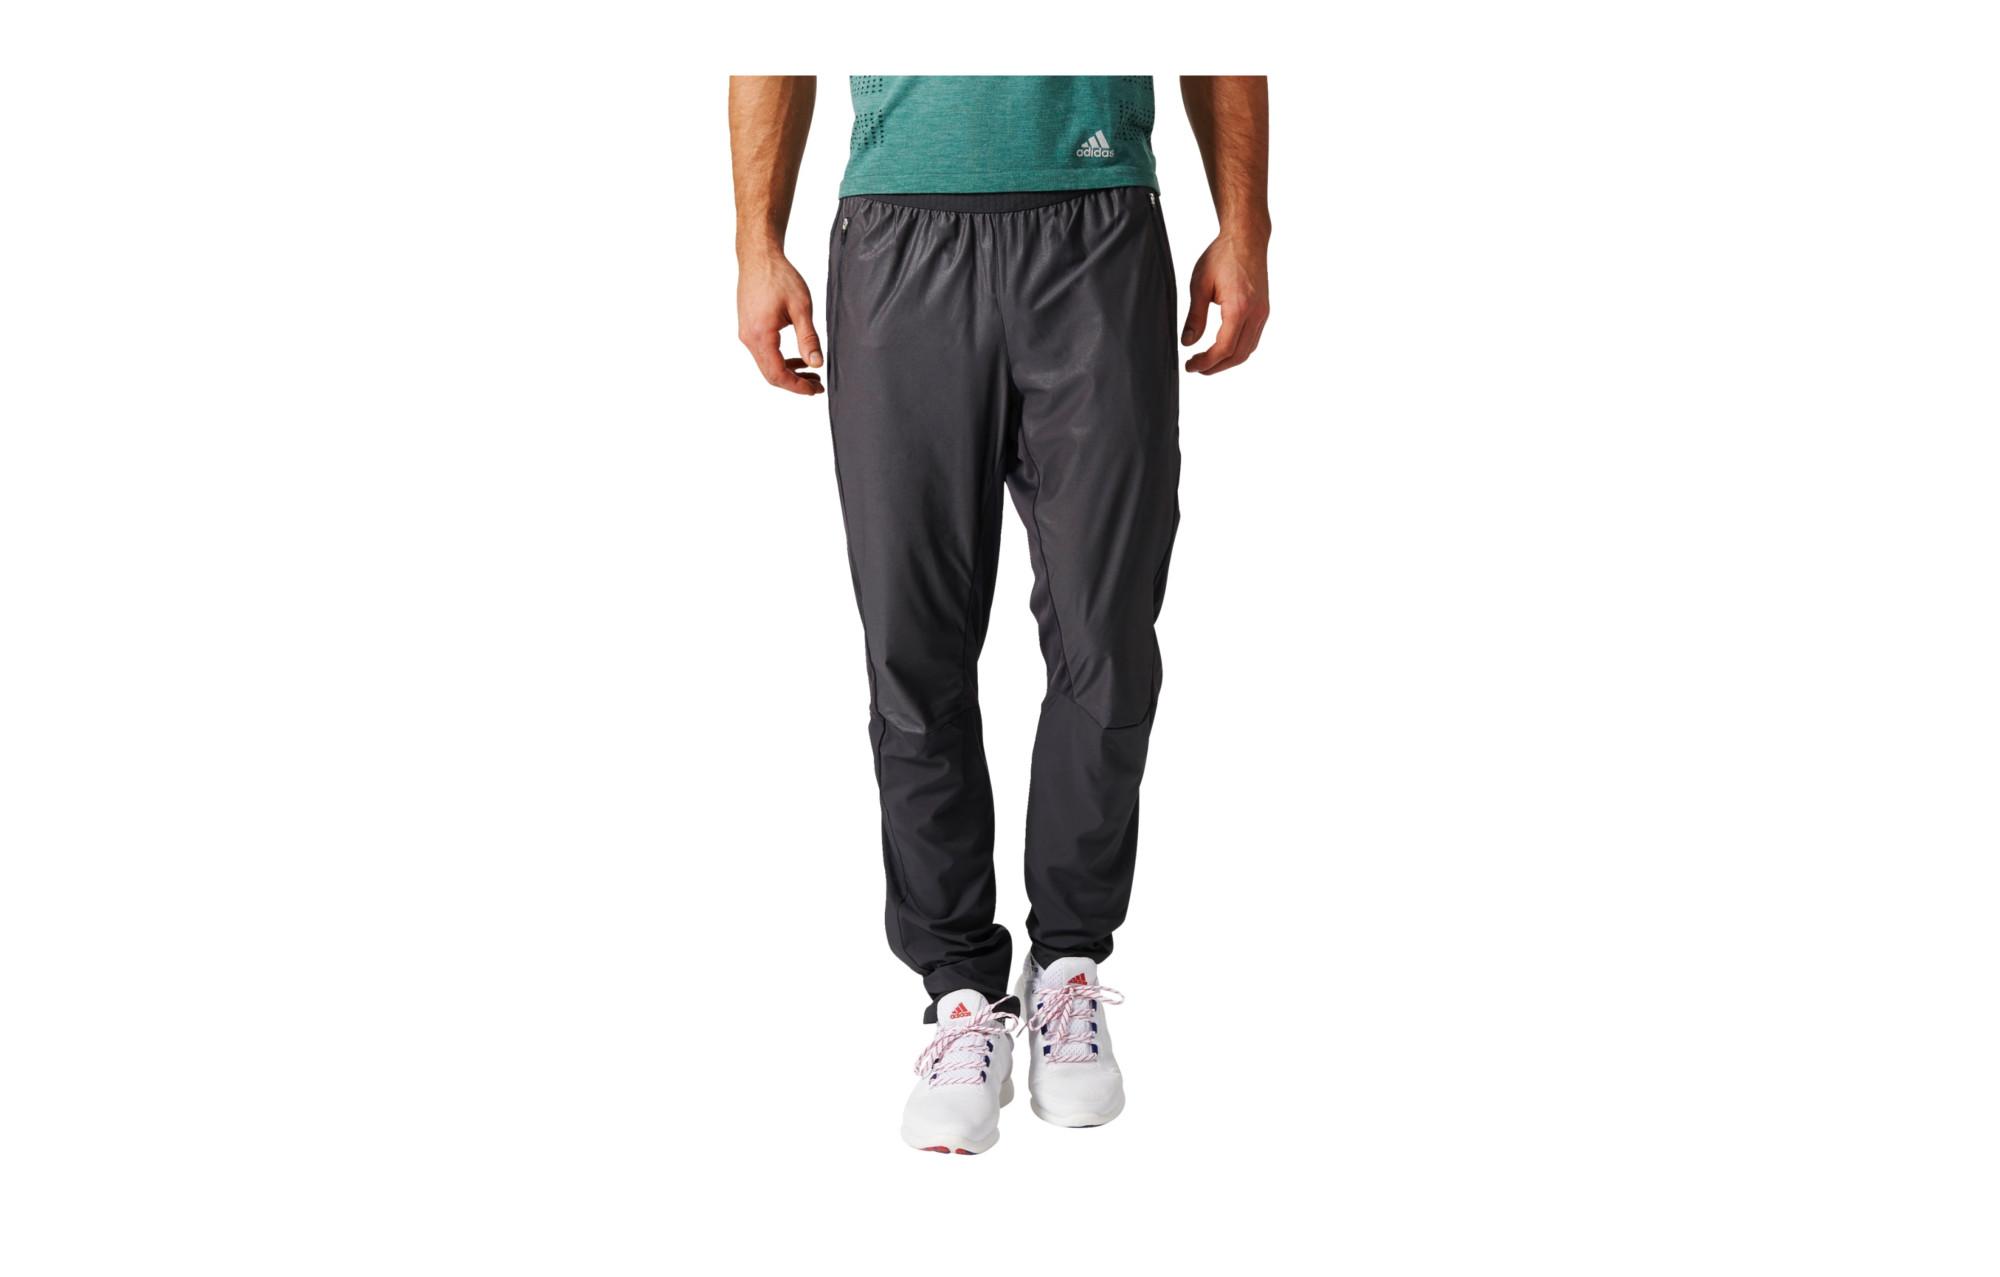 Noir Pantalon Running Imperméable Adidas Adizero Gris nymw08vNO